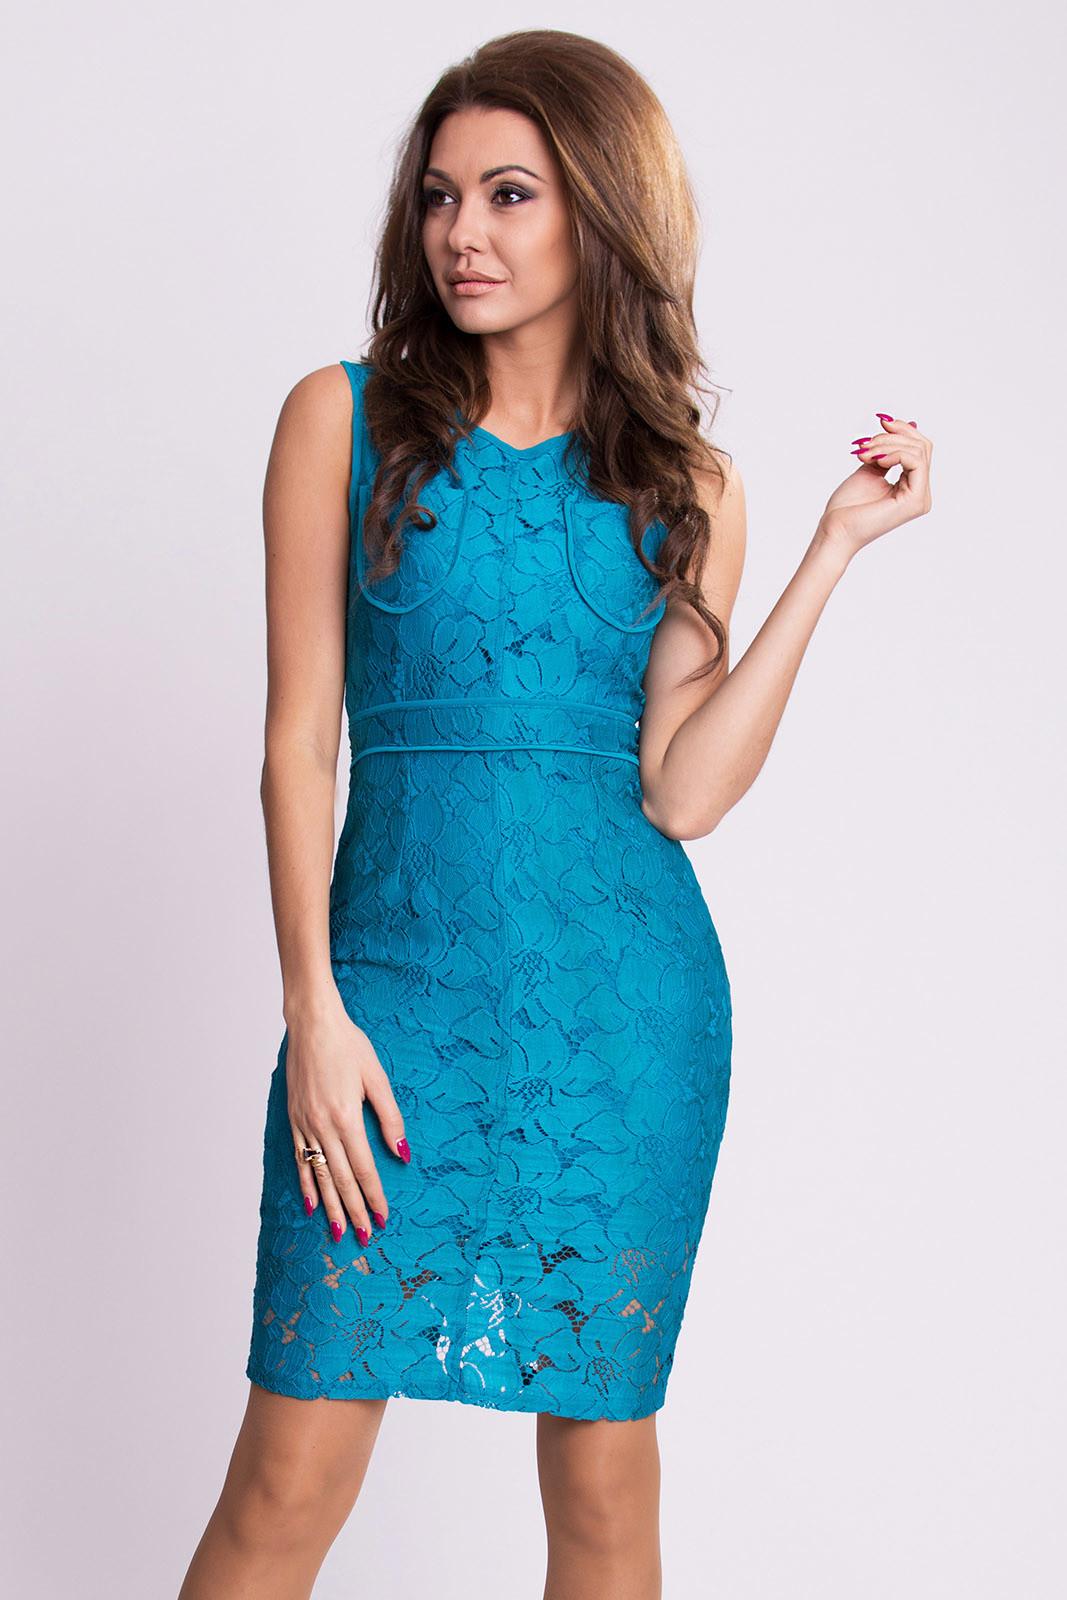 Dámske krajkové šaty EMAMODA modré - Modrá / S - EMAMODA modrá S